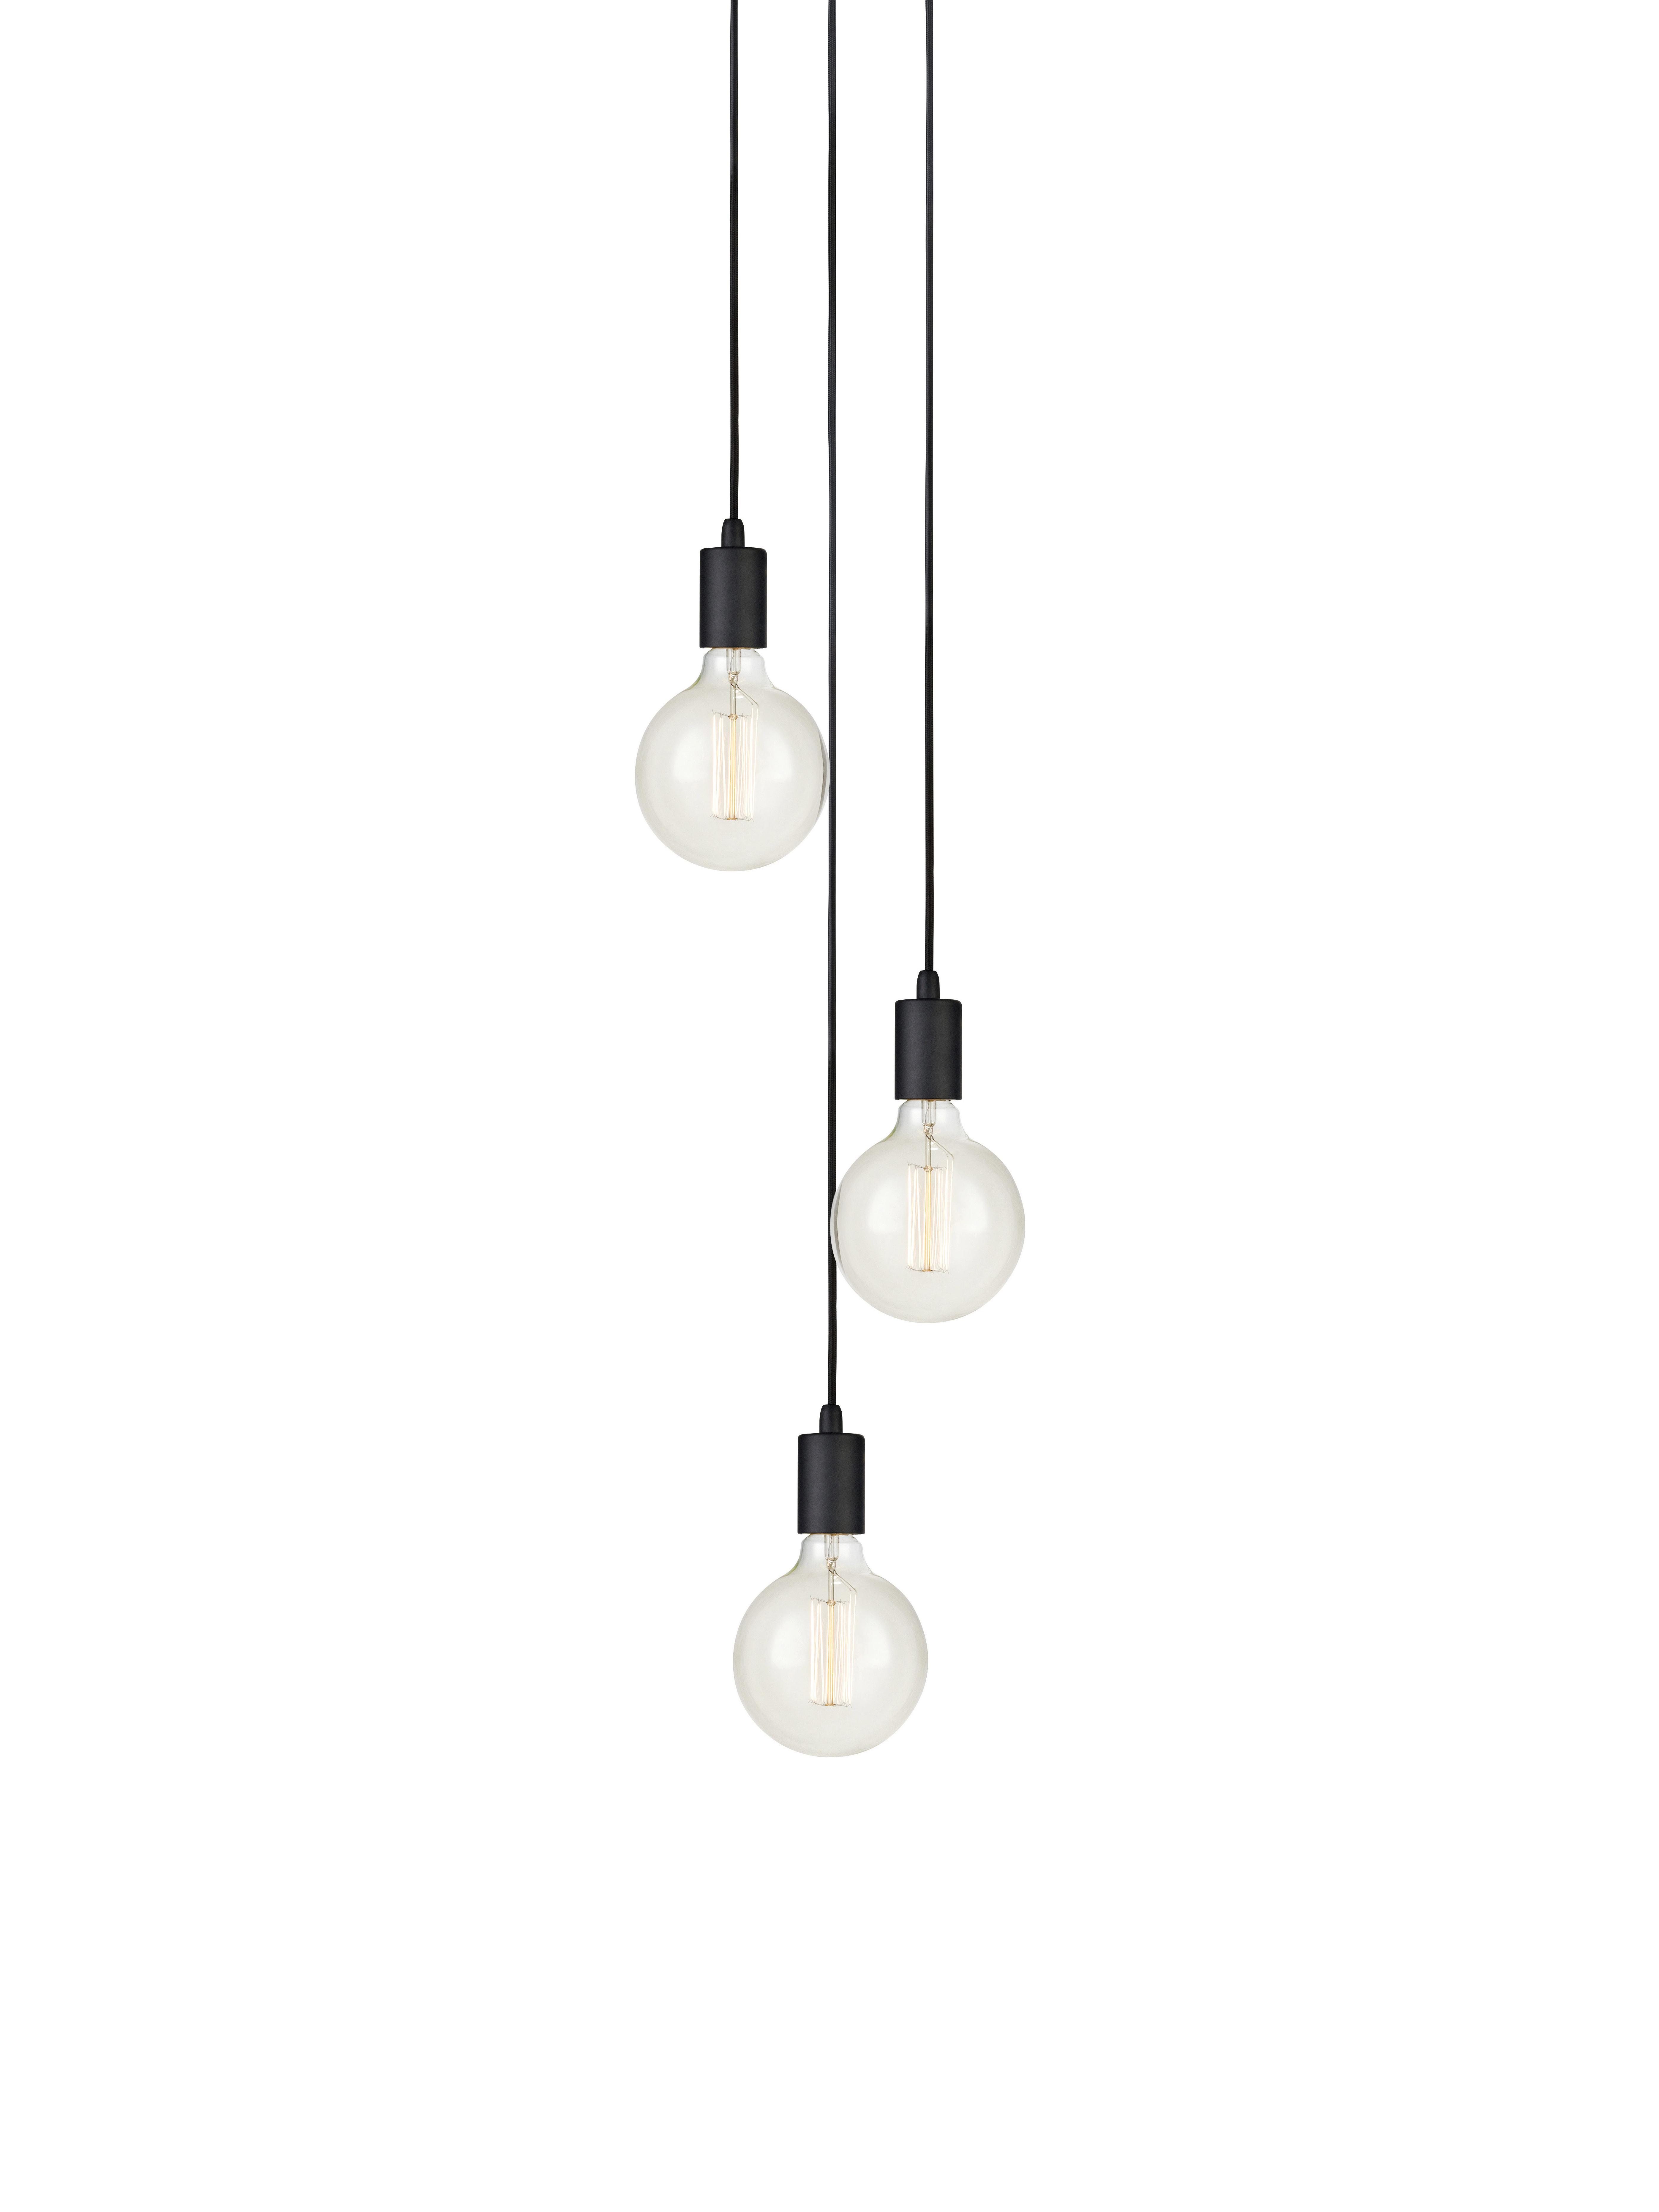 Hanglamp Sky in zwart, Zwart, Ø 25 x H 12 cm